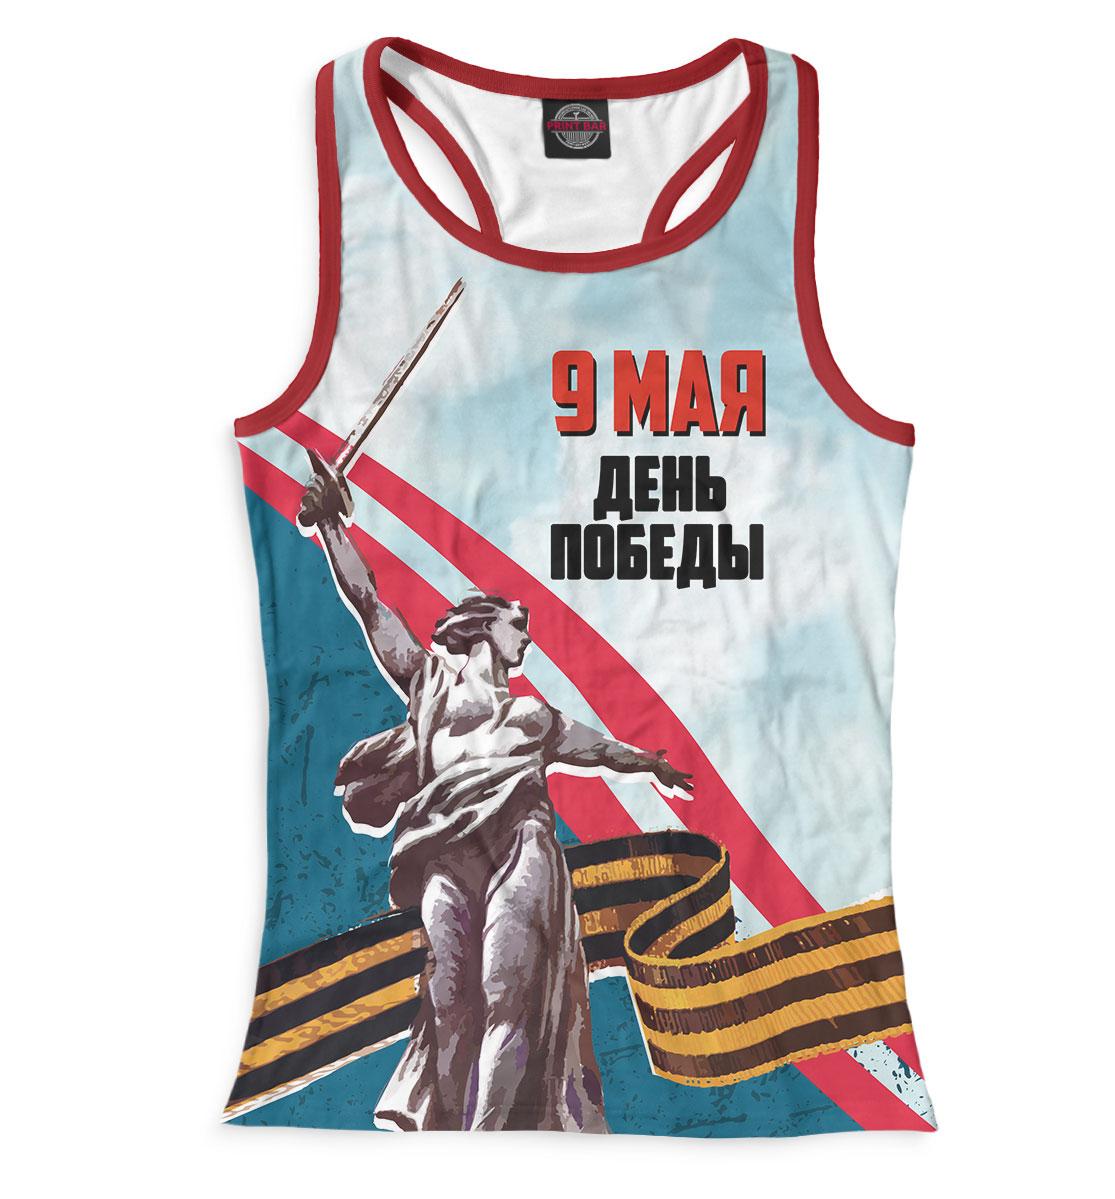 Купить 9 мая — День Победы, Printbar, Майки борцовки, 9MA-473856-mayb-1